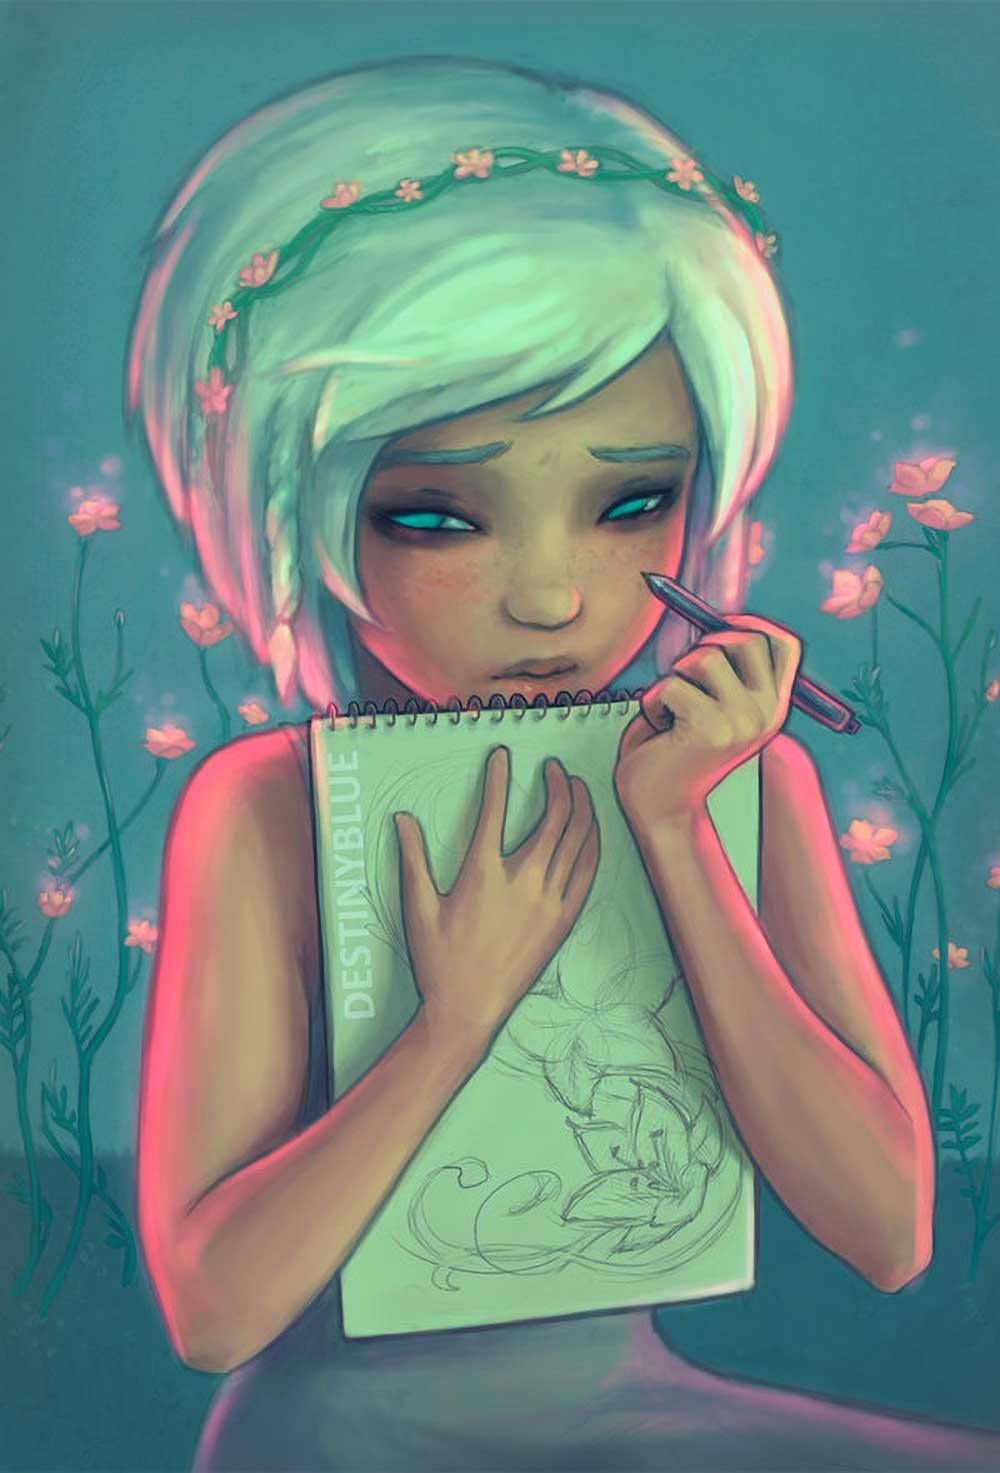 Inspirational Art : Don't Watch Me Draw by DestinyBlue